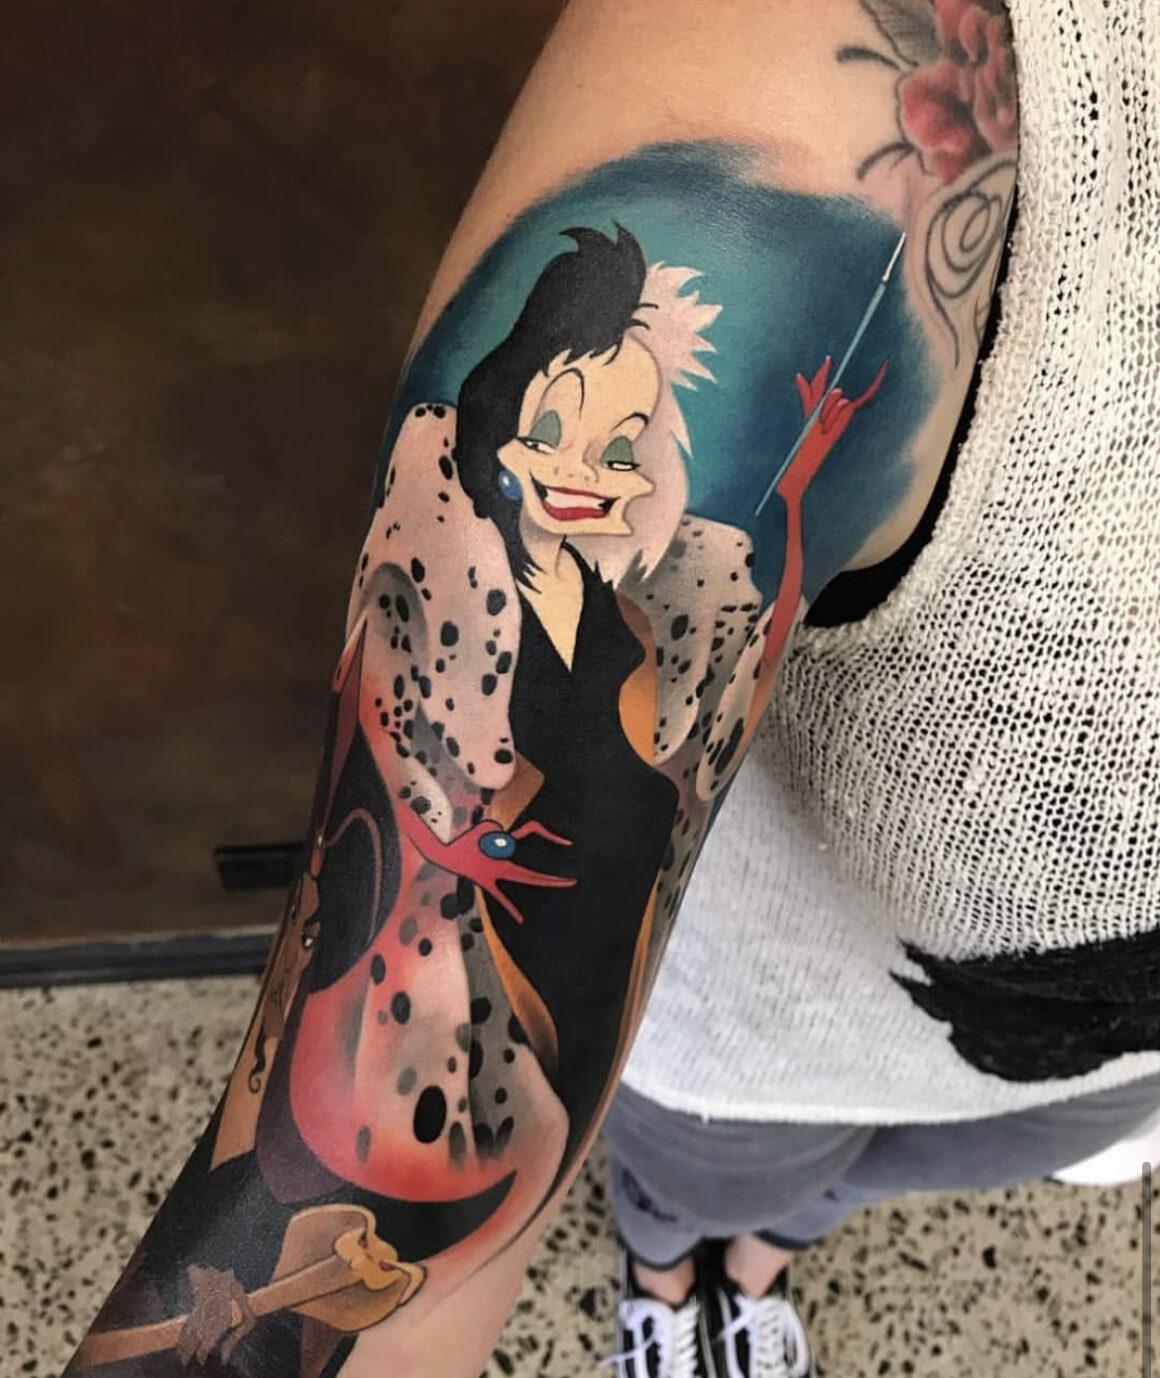 Jacksonmay, Youngbloods Tattoo Studio, Perth, Australia